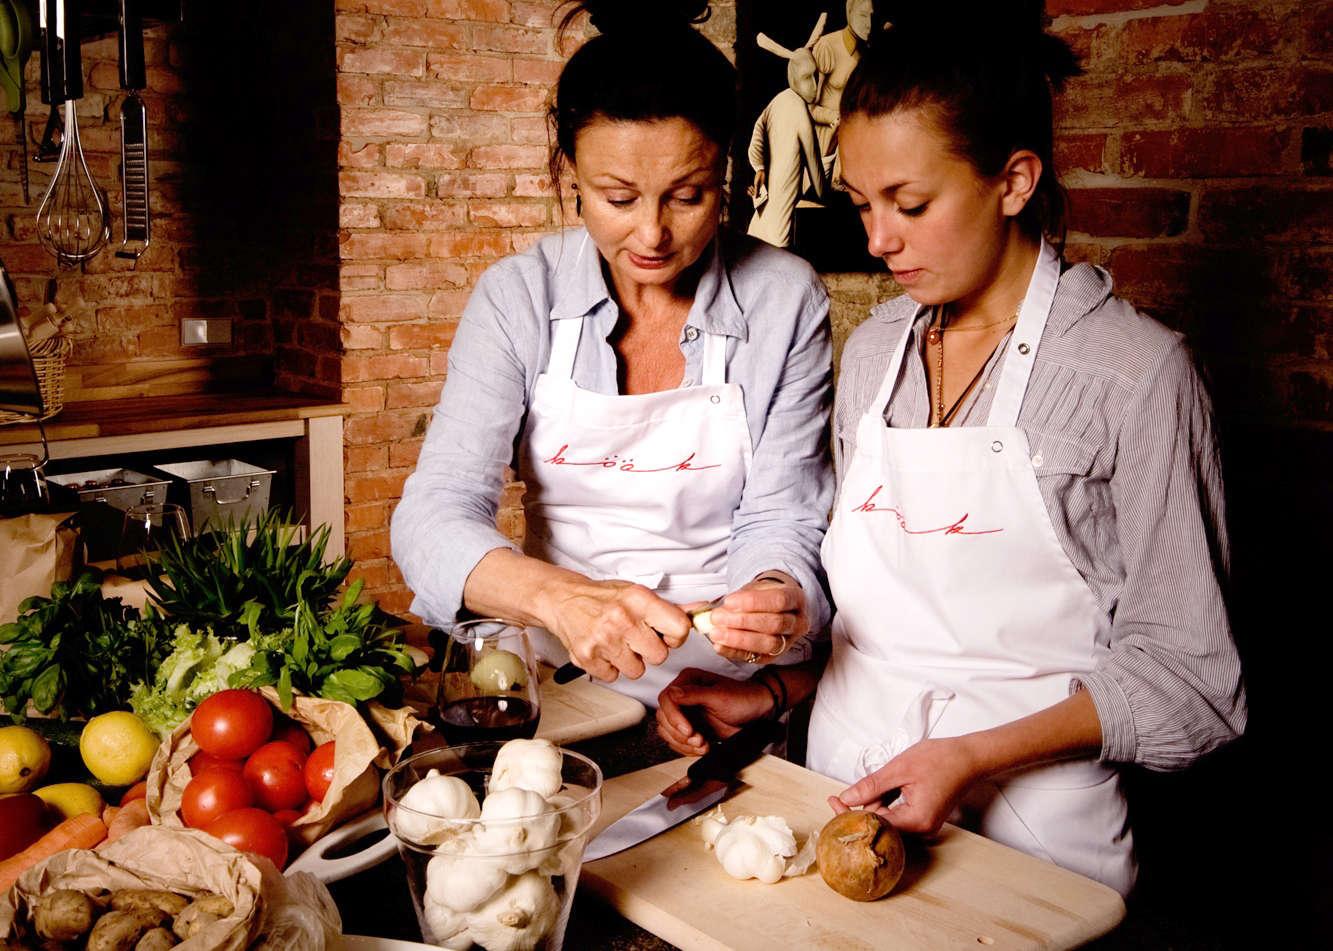 culinary arts_incentive